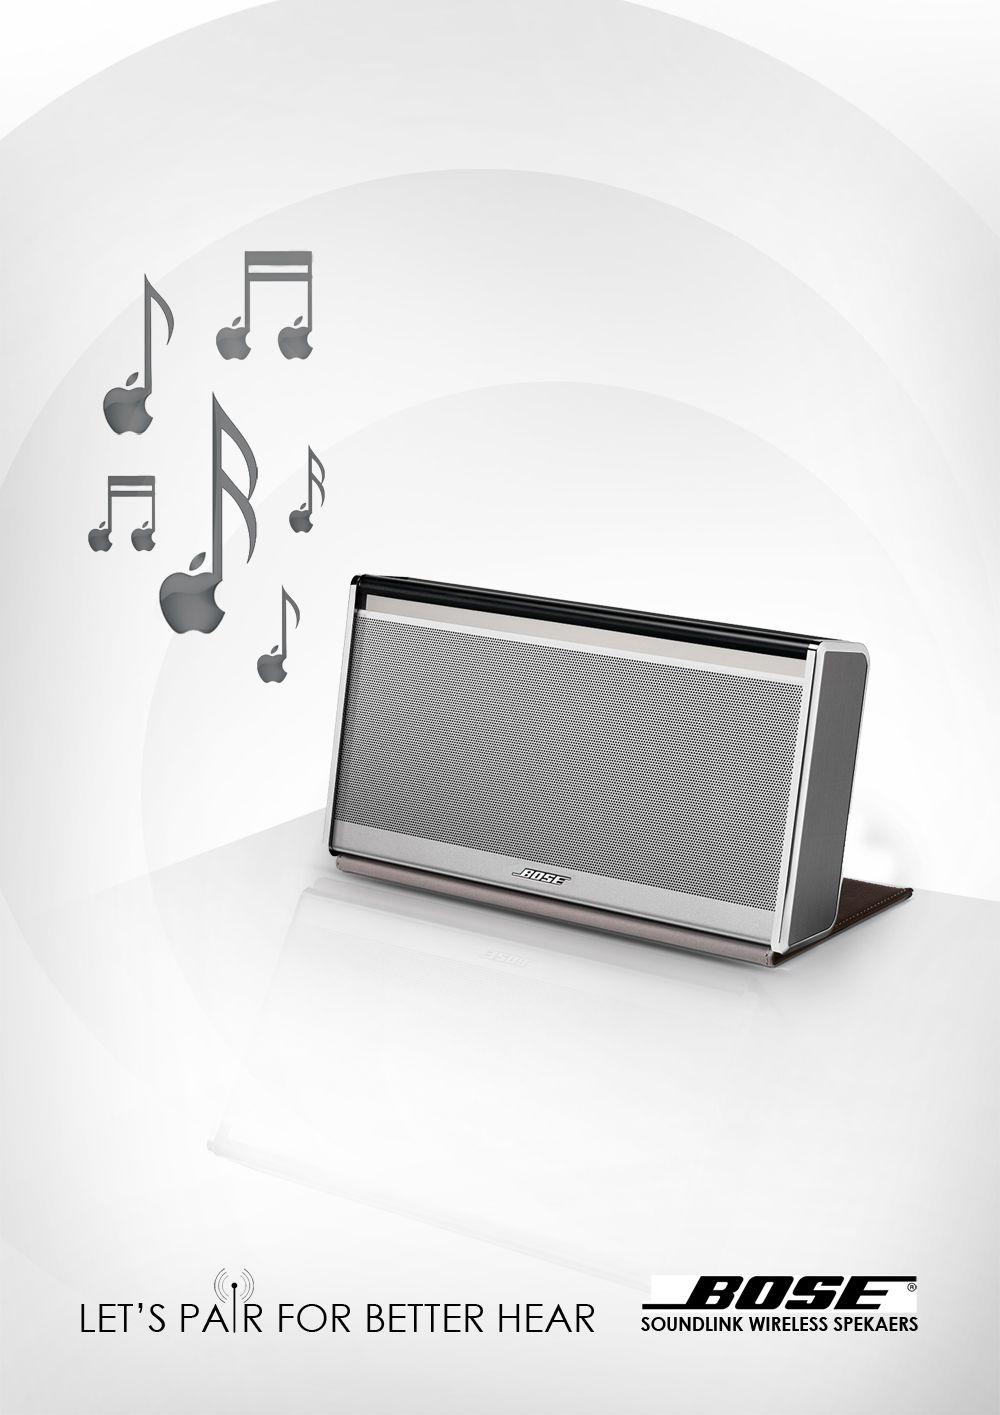 mir ekhtiar bose bose wireless speakers